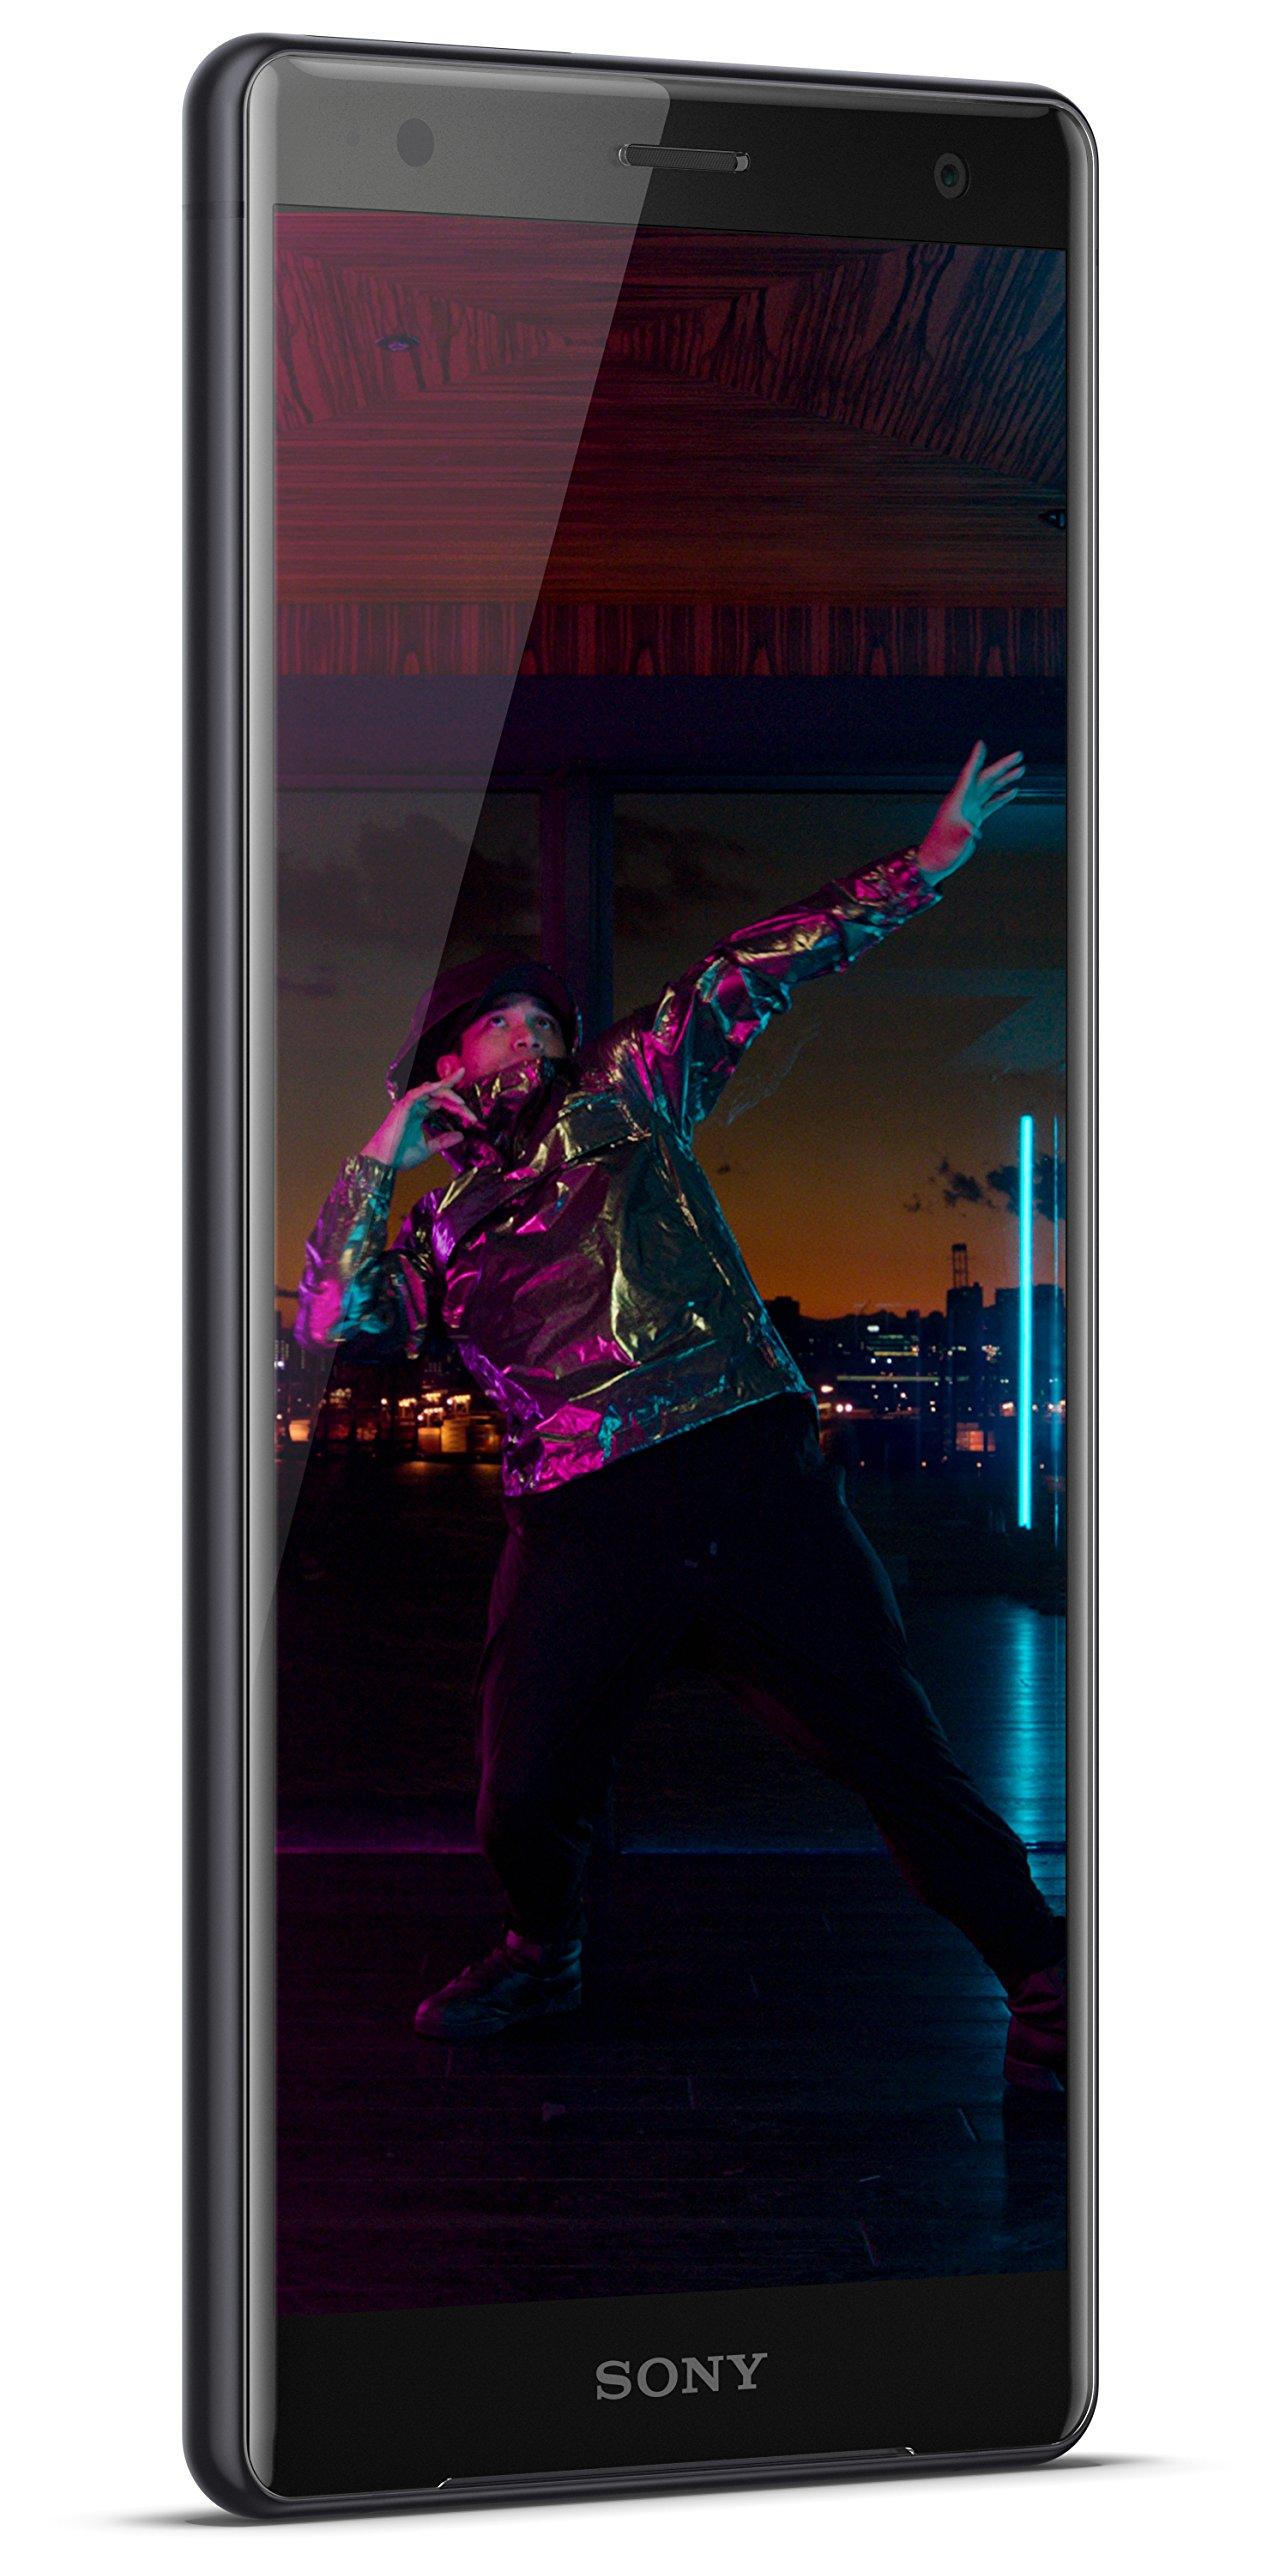 Sony Xperia XZ2 Unlocked Smartphone - 5.7'' Screen - 64GB - Liquid Black (US Warranty)